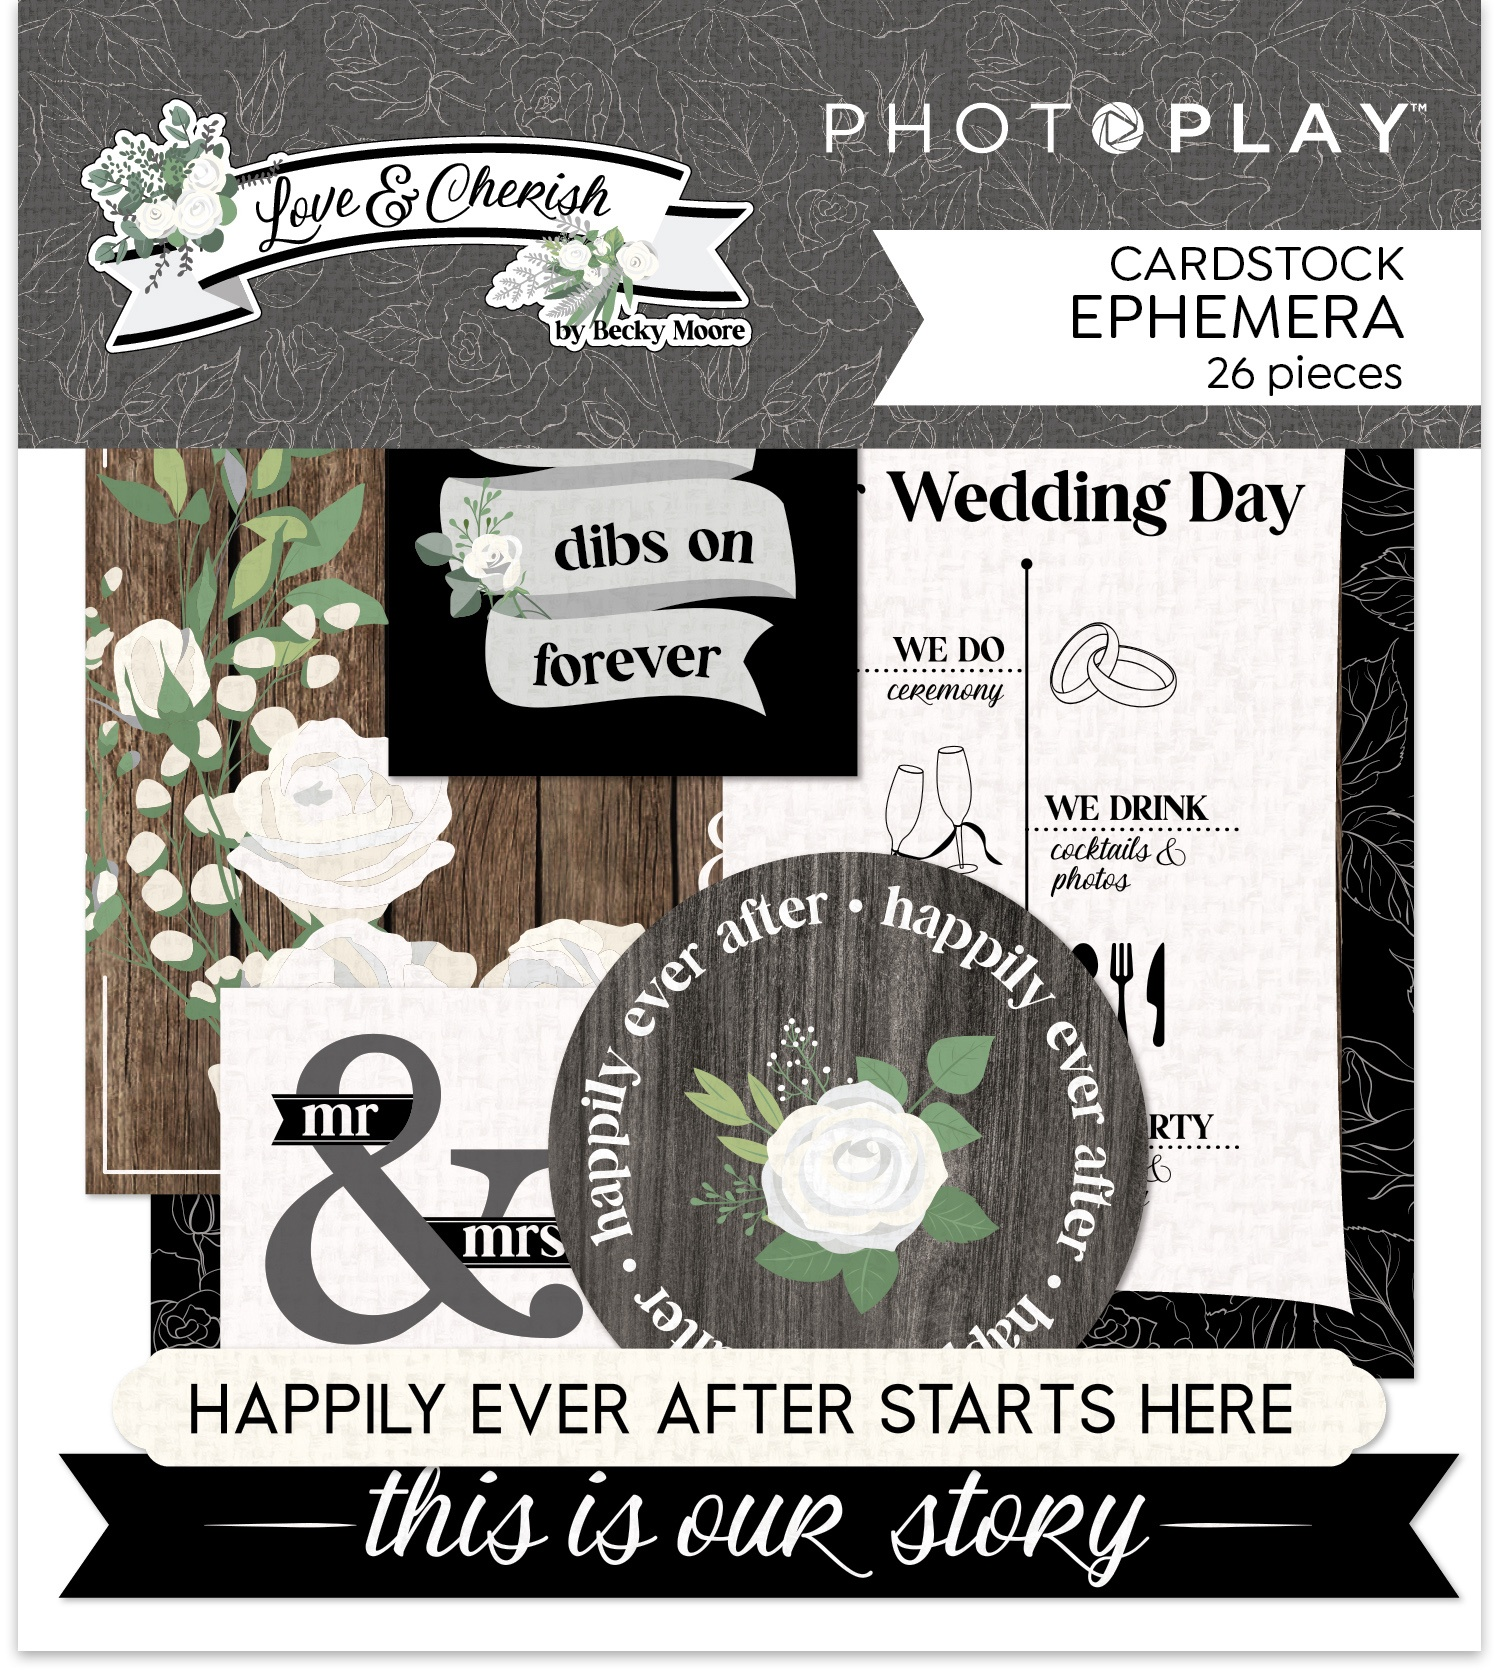 Love & Cherish Ephemera Cardstock Die-Cuts-